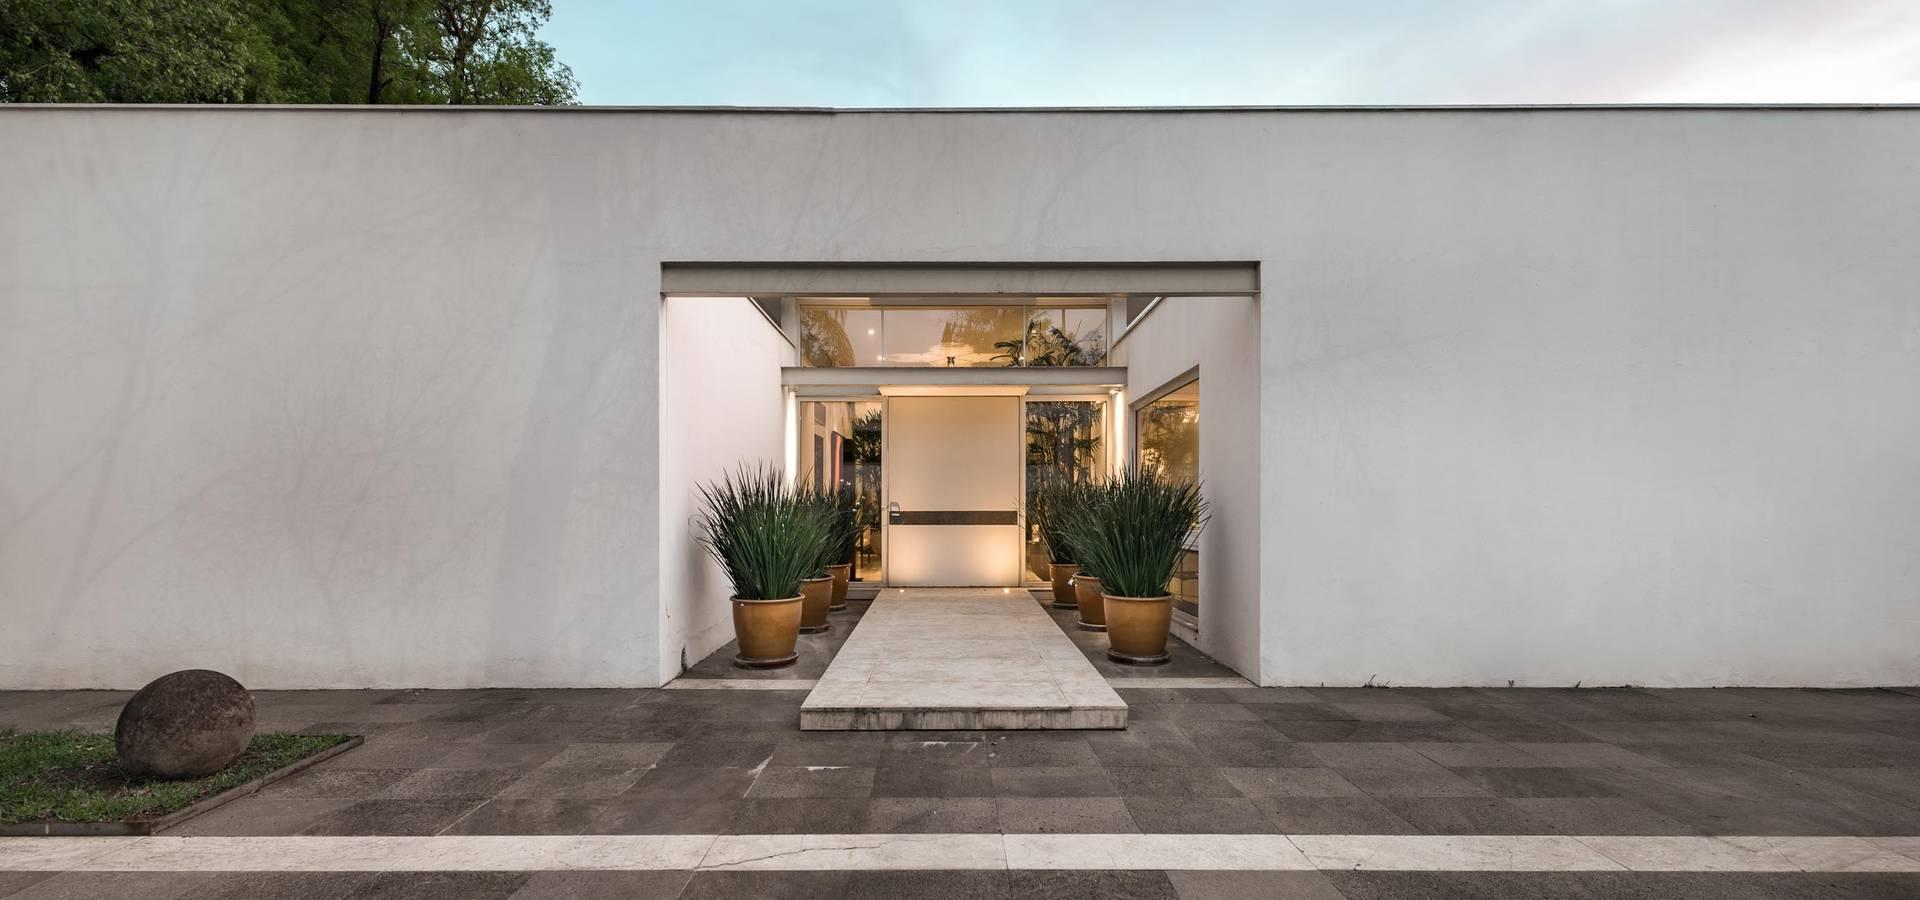 Eduardo Alarcón Fotografía Arquitectónica